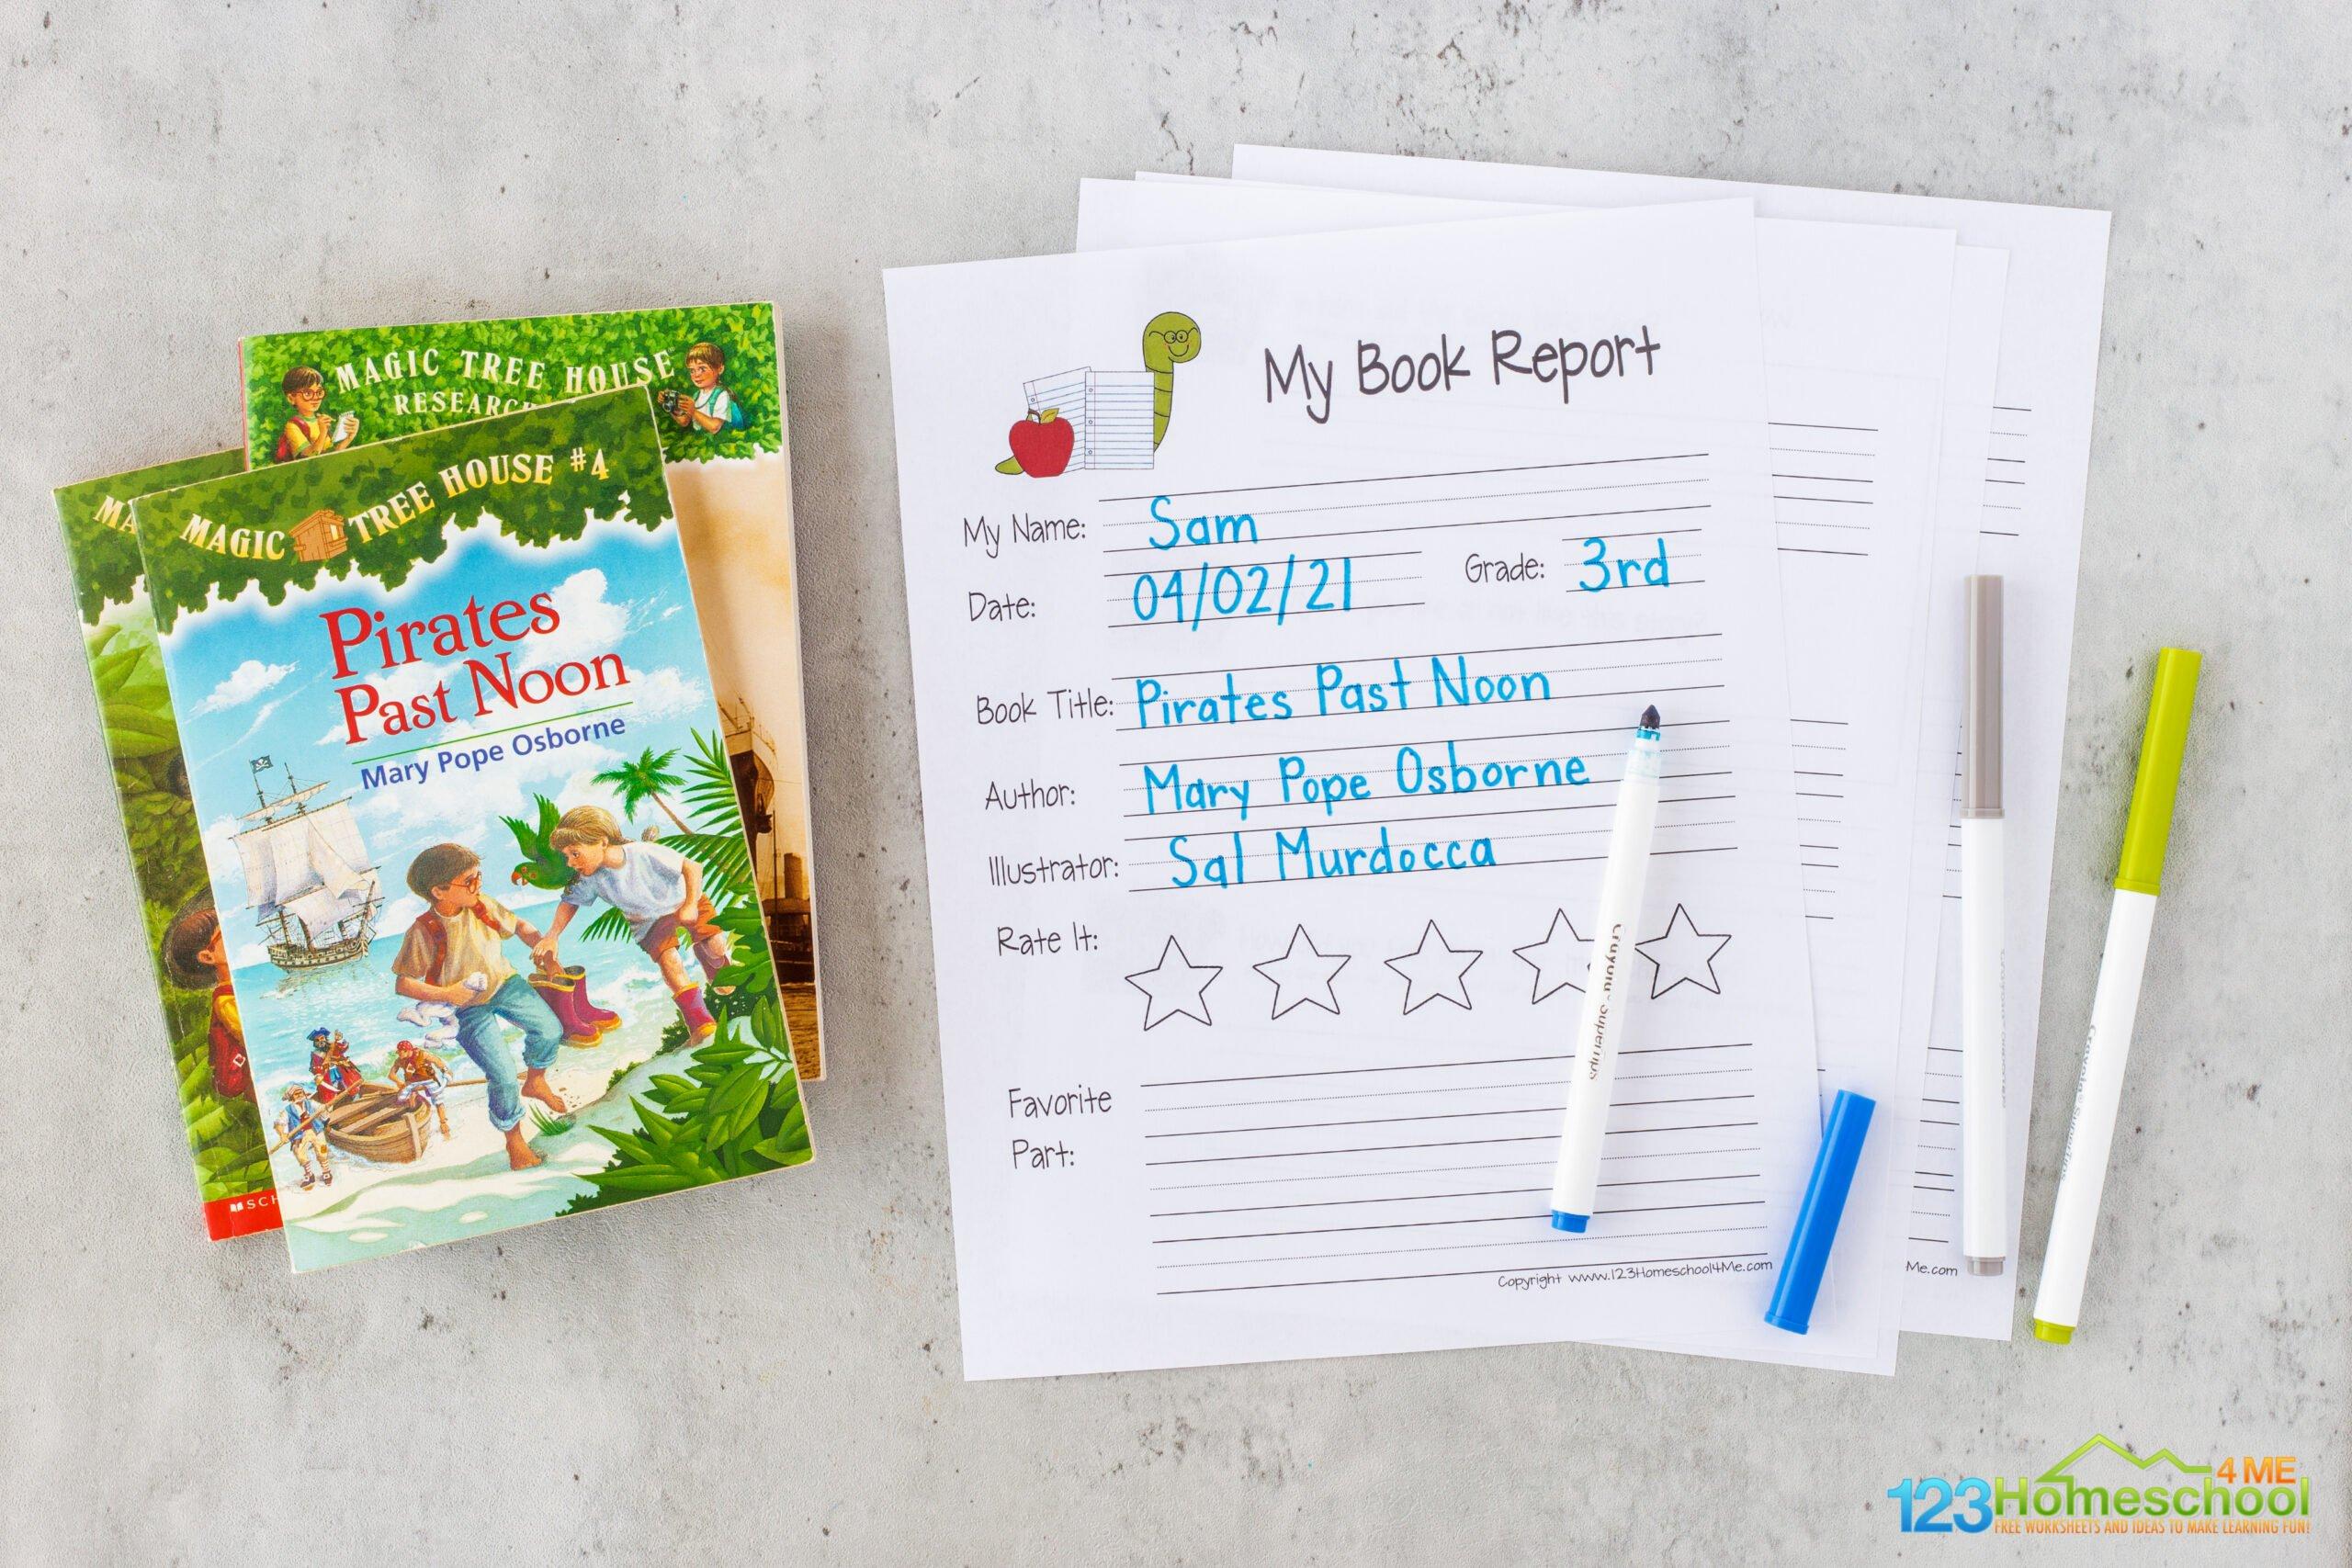 Good books for second grade book reports custom paper writing website uk